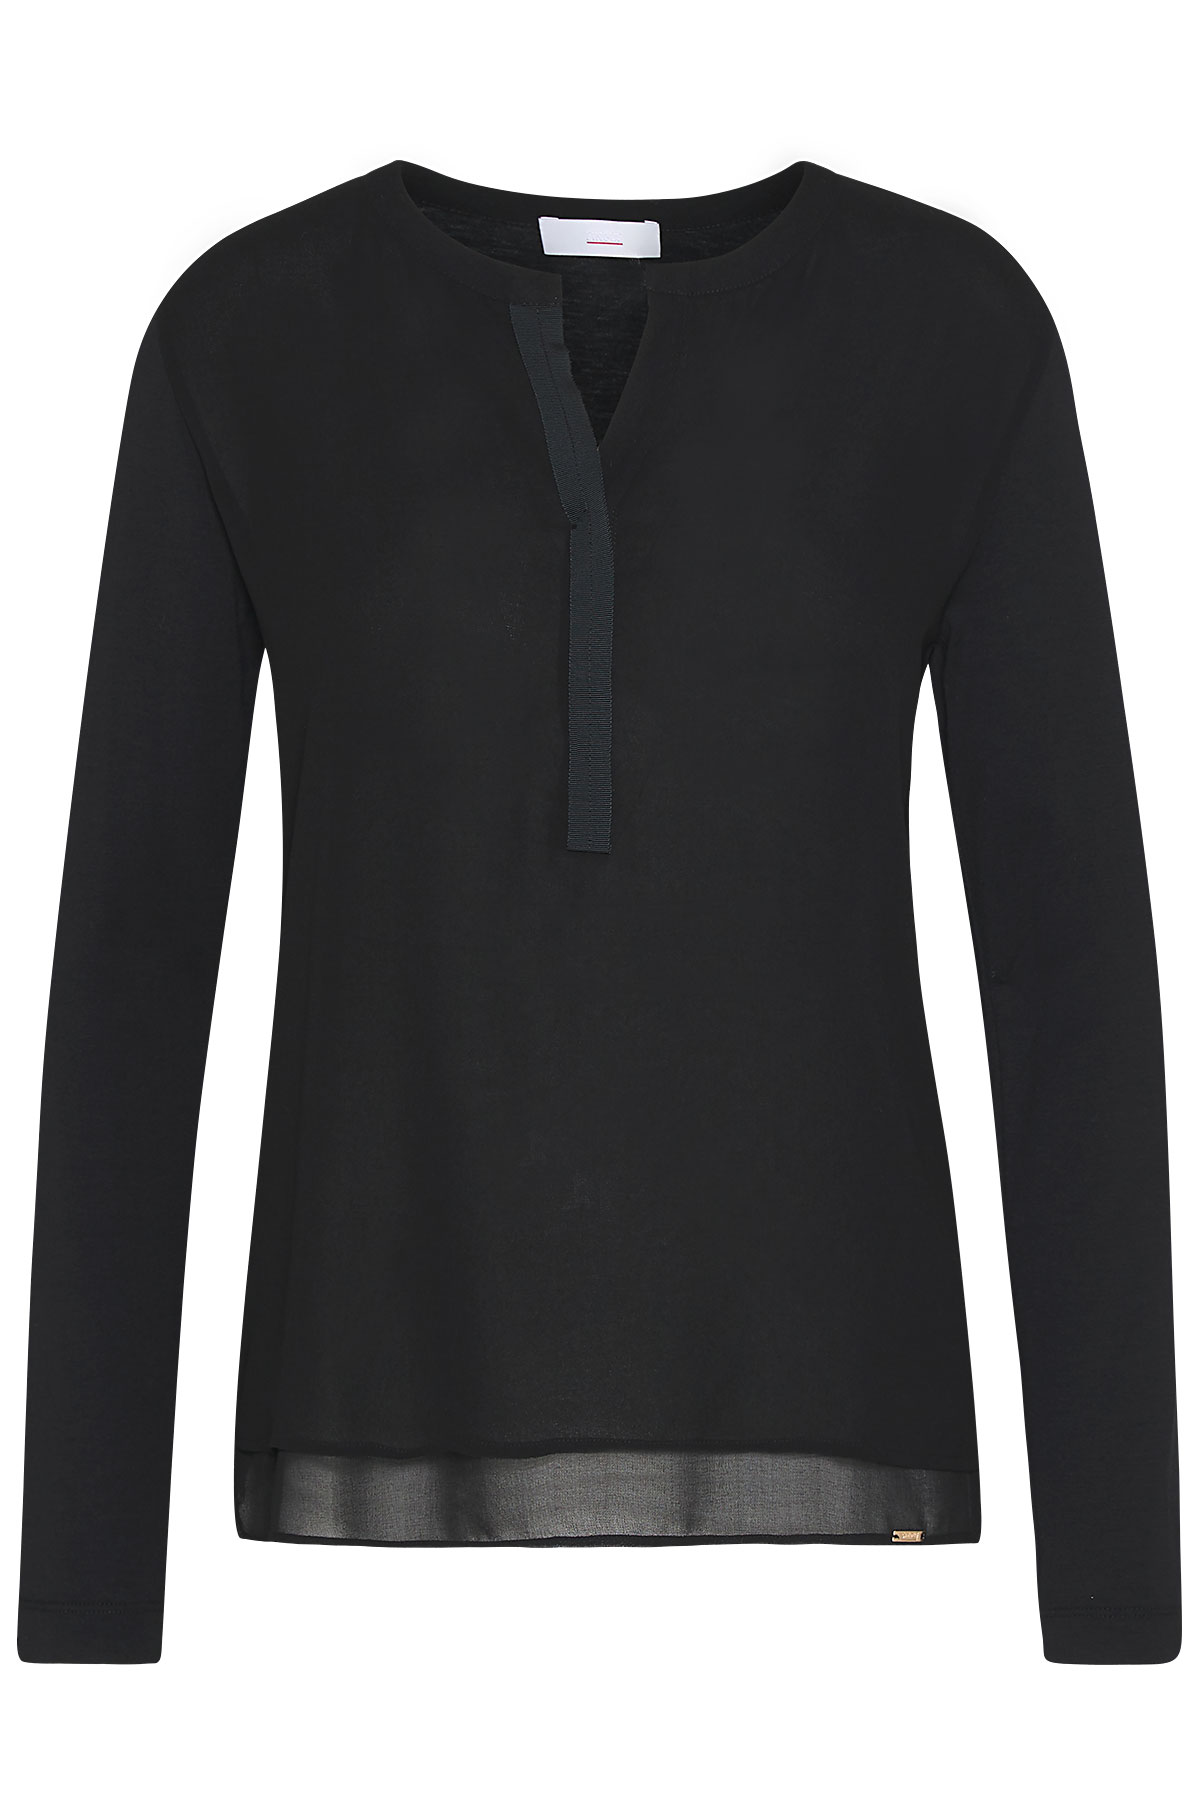 Cinque langarm Shirt schwarz